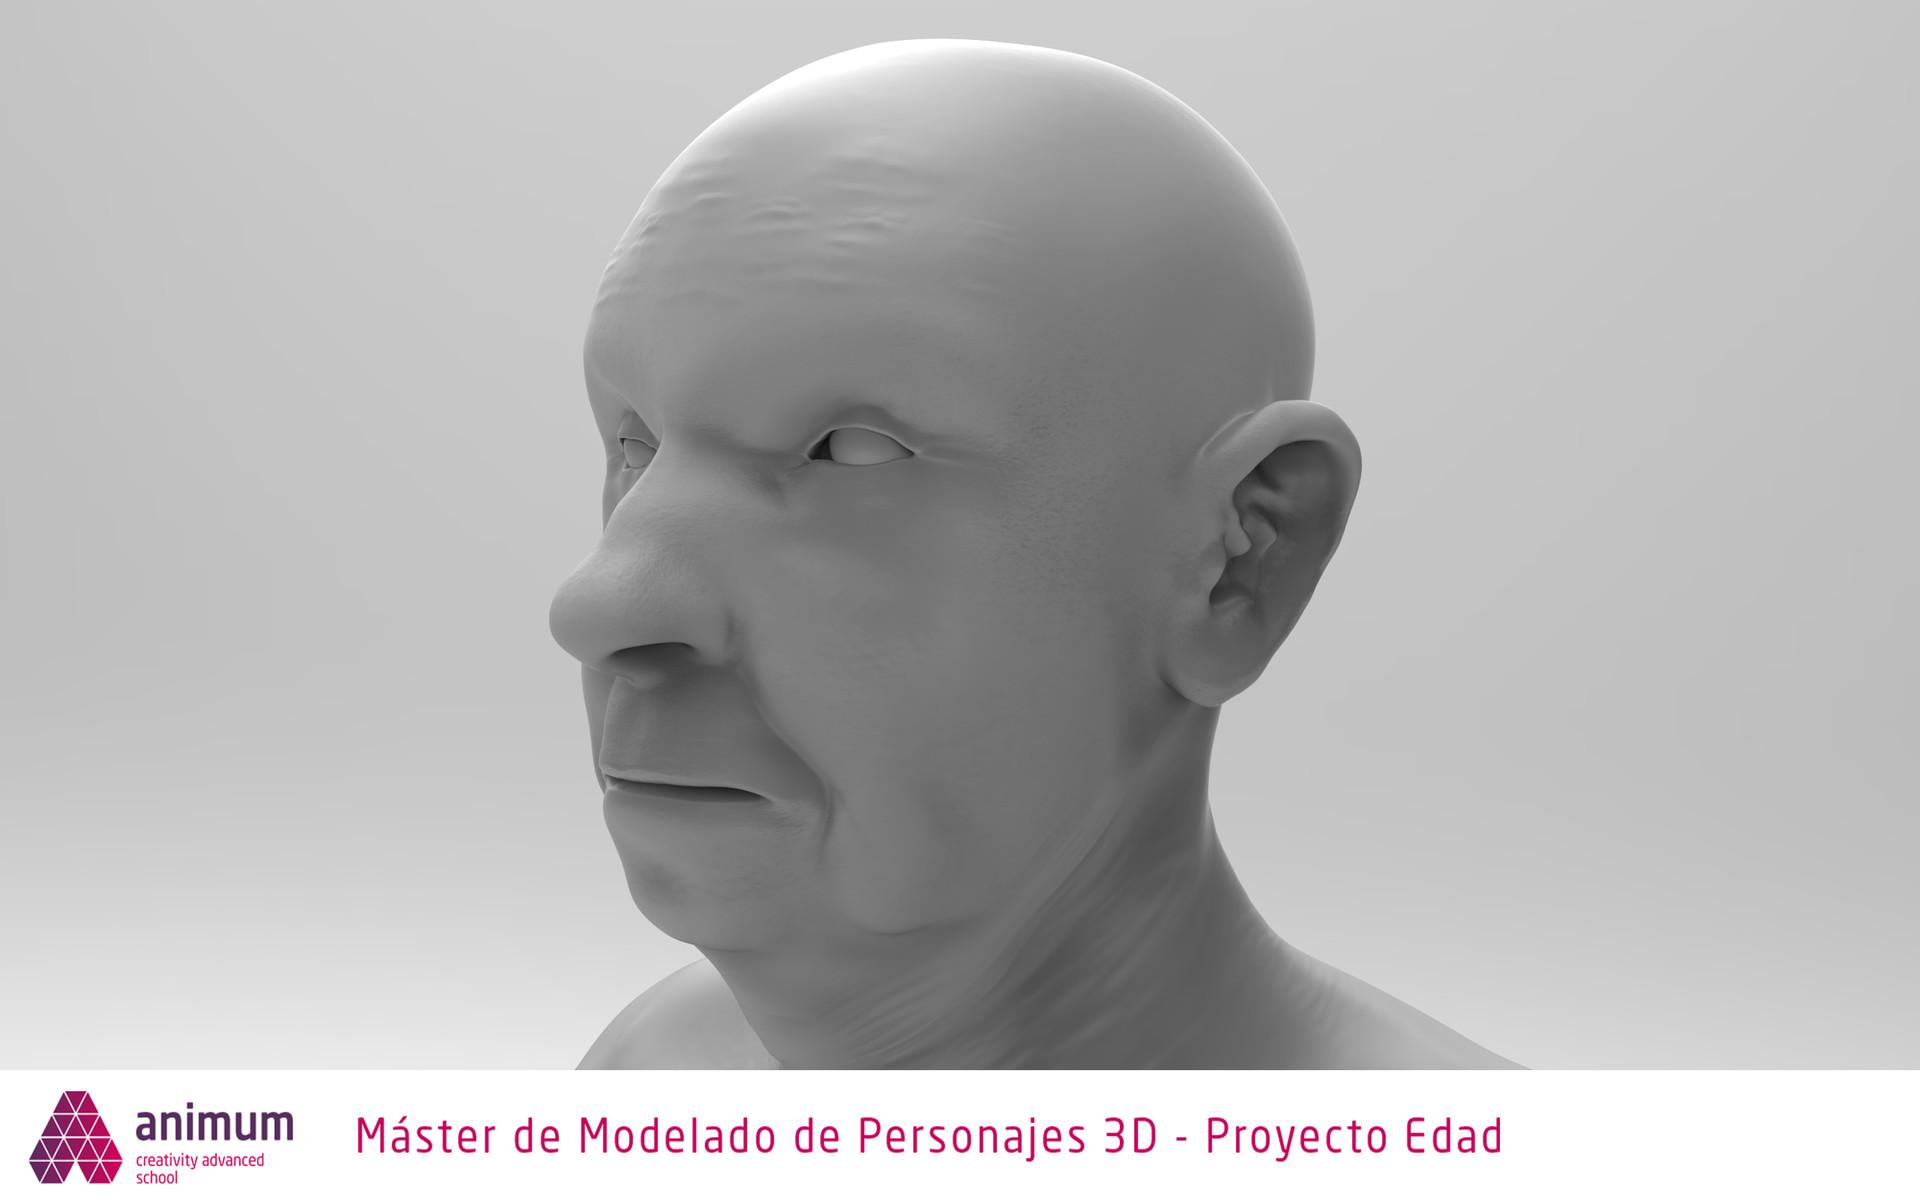 Javier Mateos - Old man anatomy